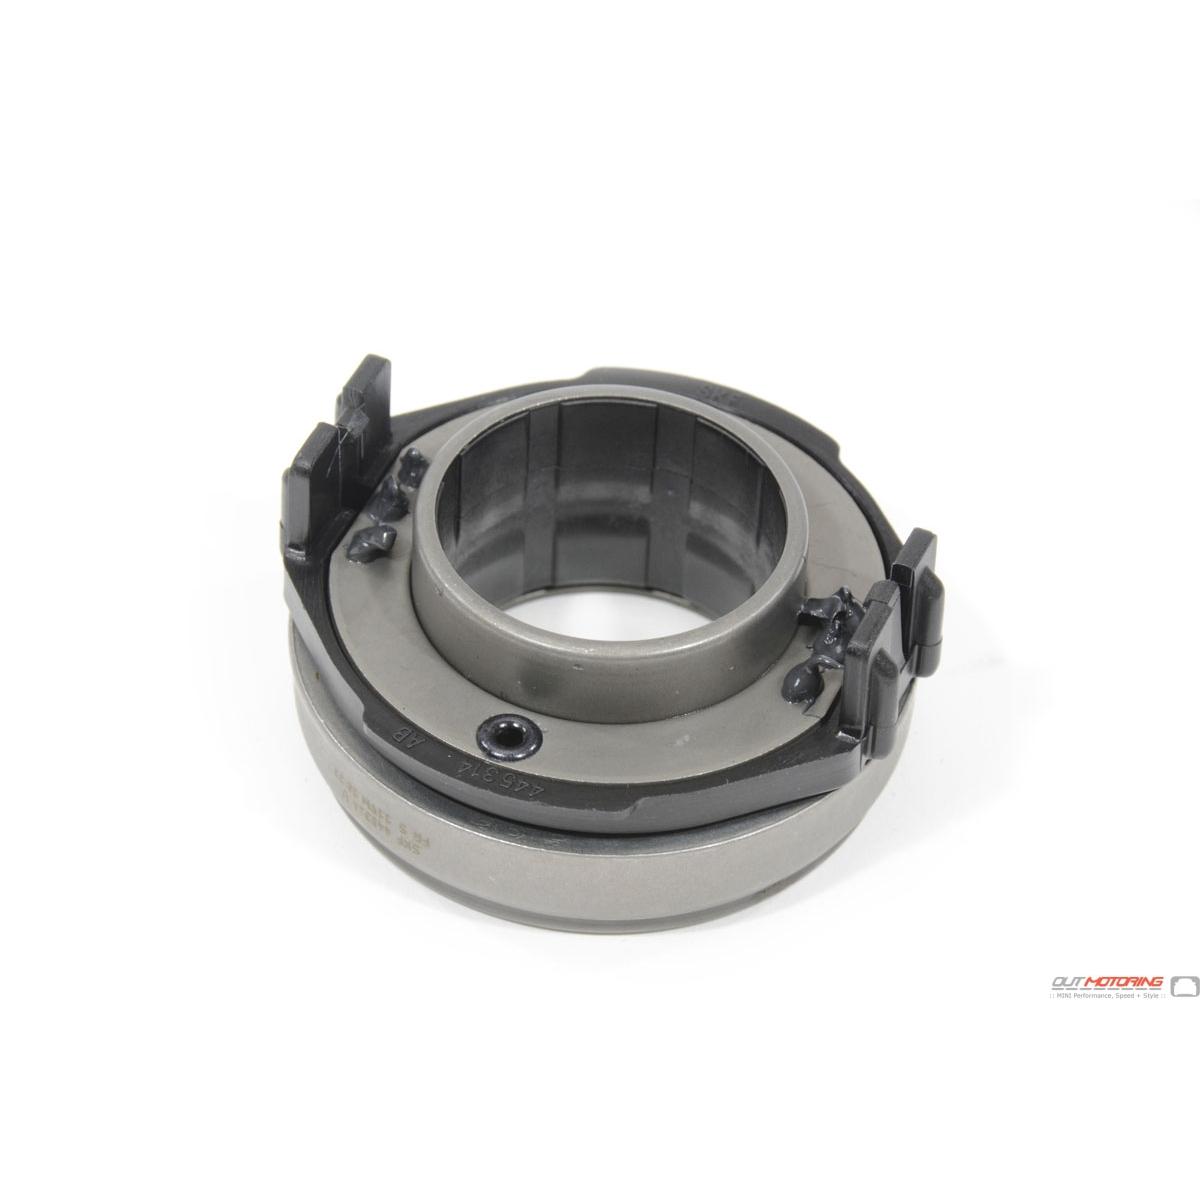 Used Mini Cooper Convertible >> MINI Cooper Replacement Clutch Release Bearing 21517547077 - MINI Cooper Accessories + MINI ...